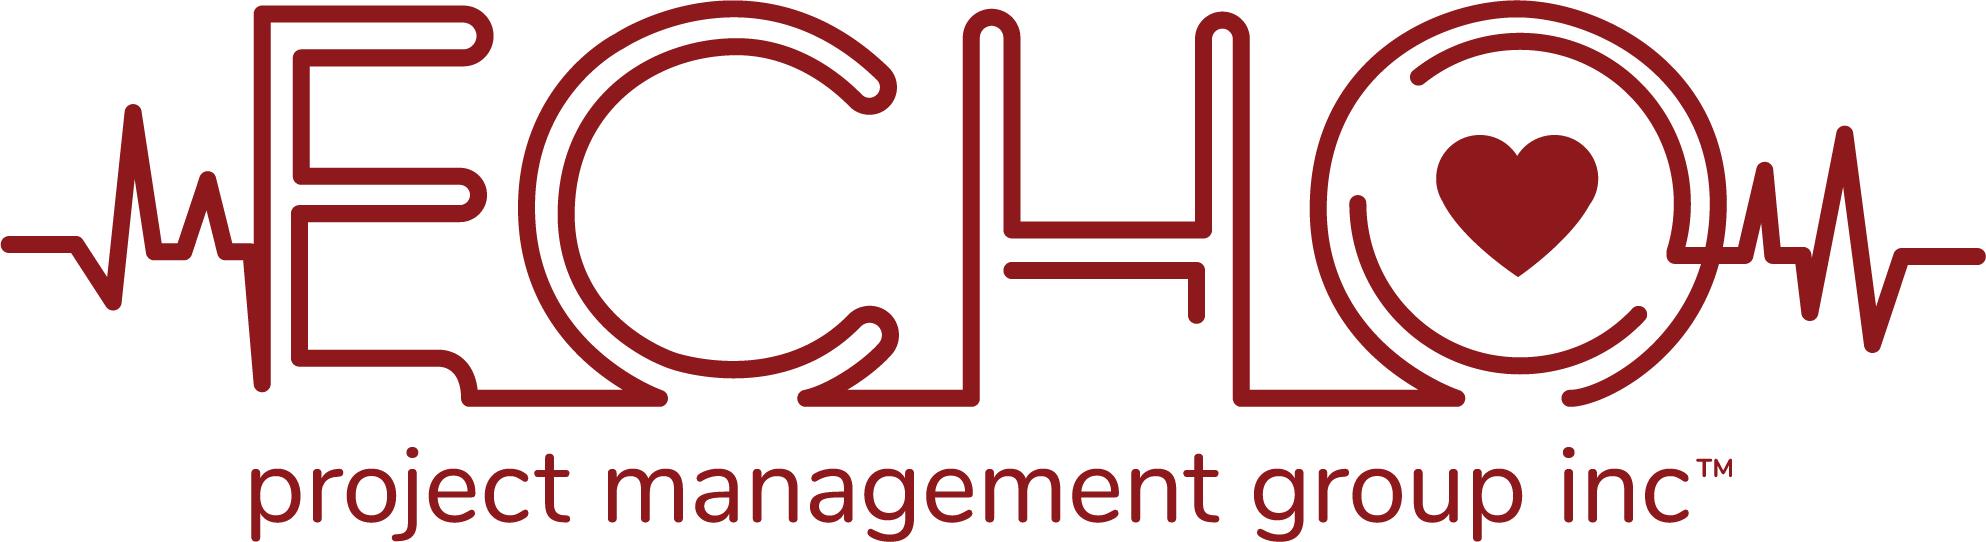 Echo Project Management Group, Inc.